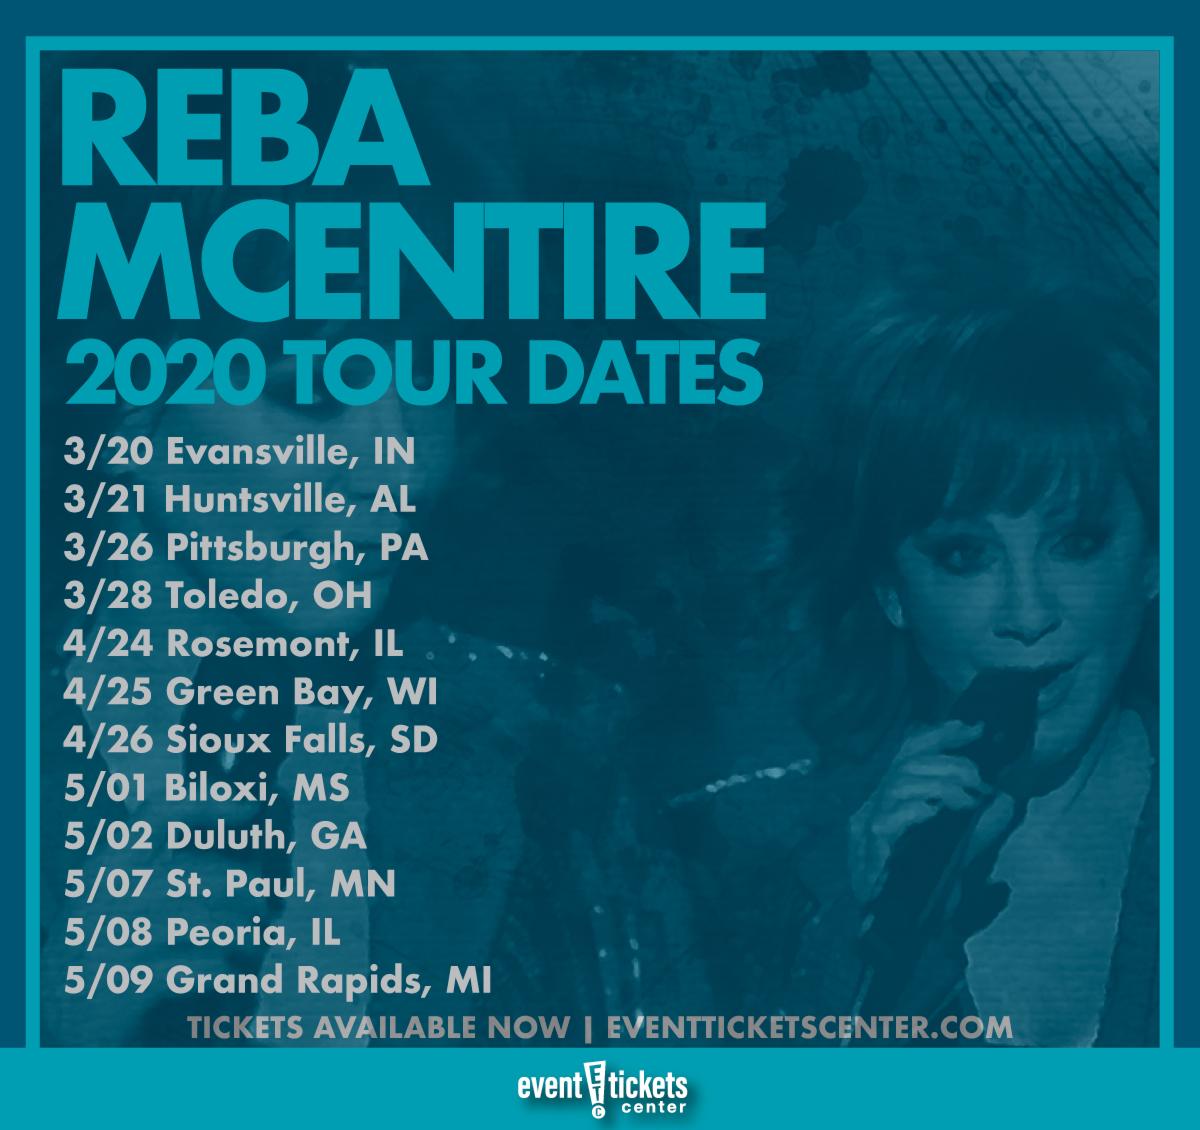 reba mcentire tickets 2020